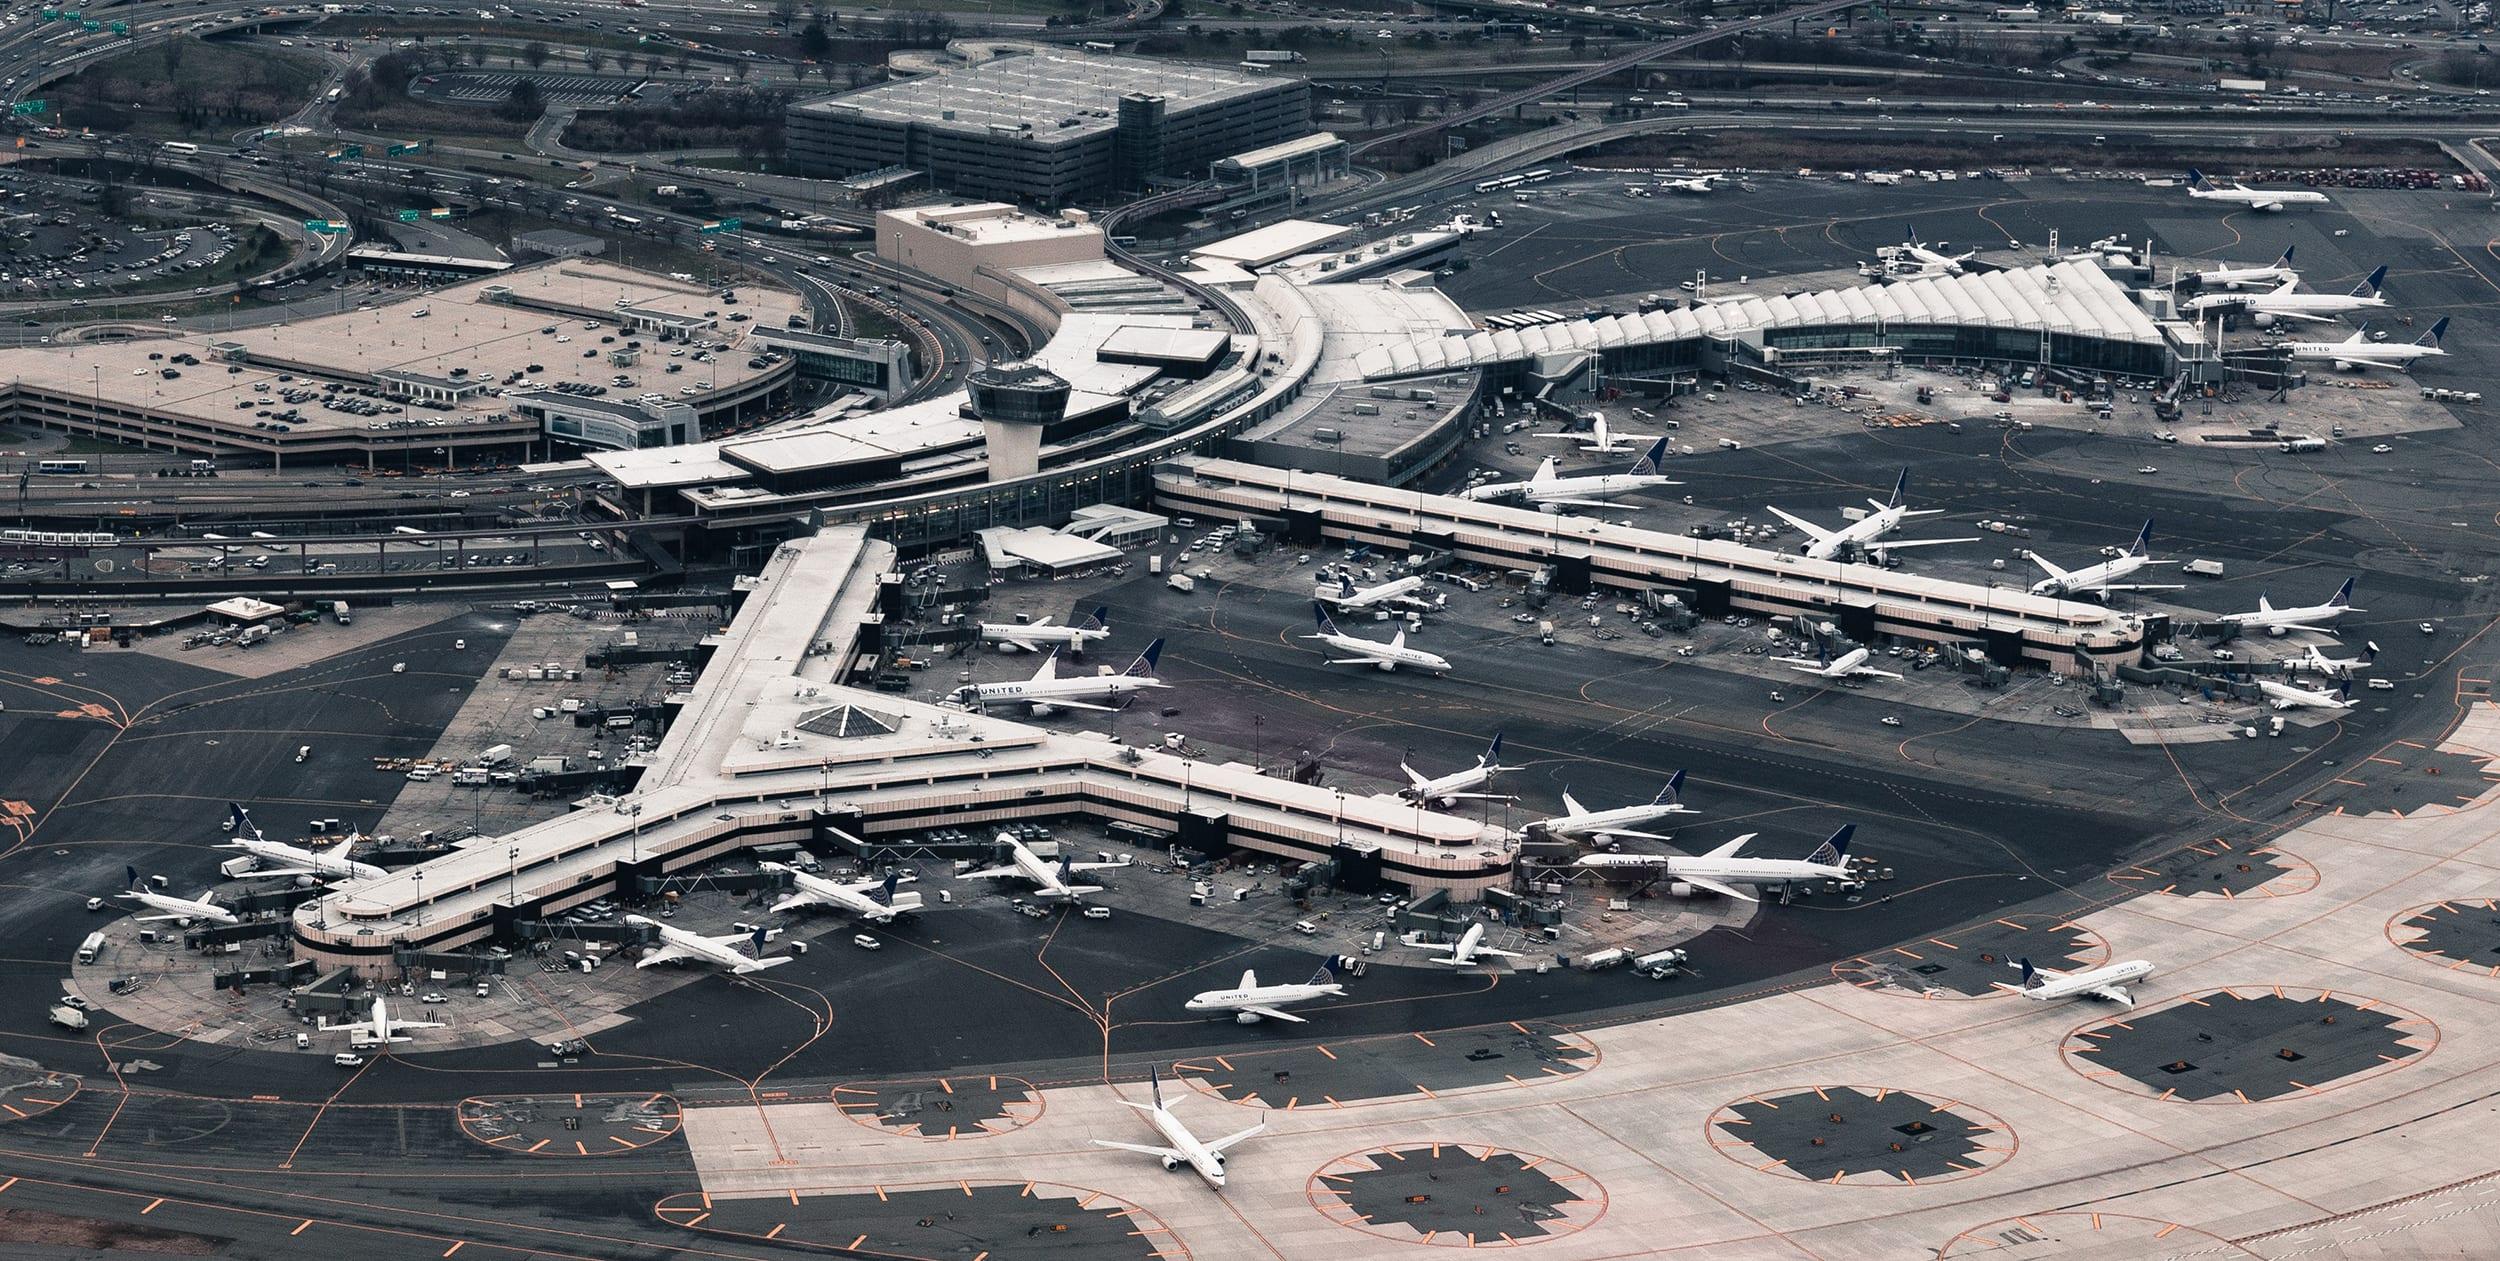 Adioso flight search results SFO to Europe